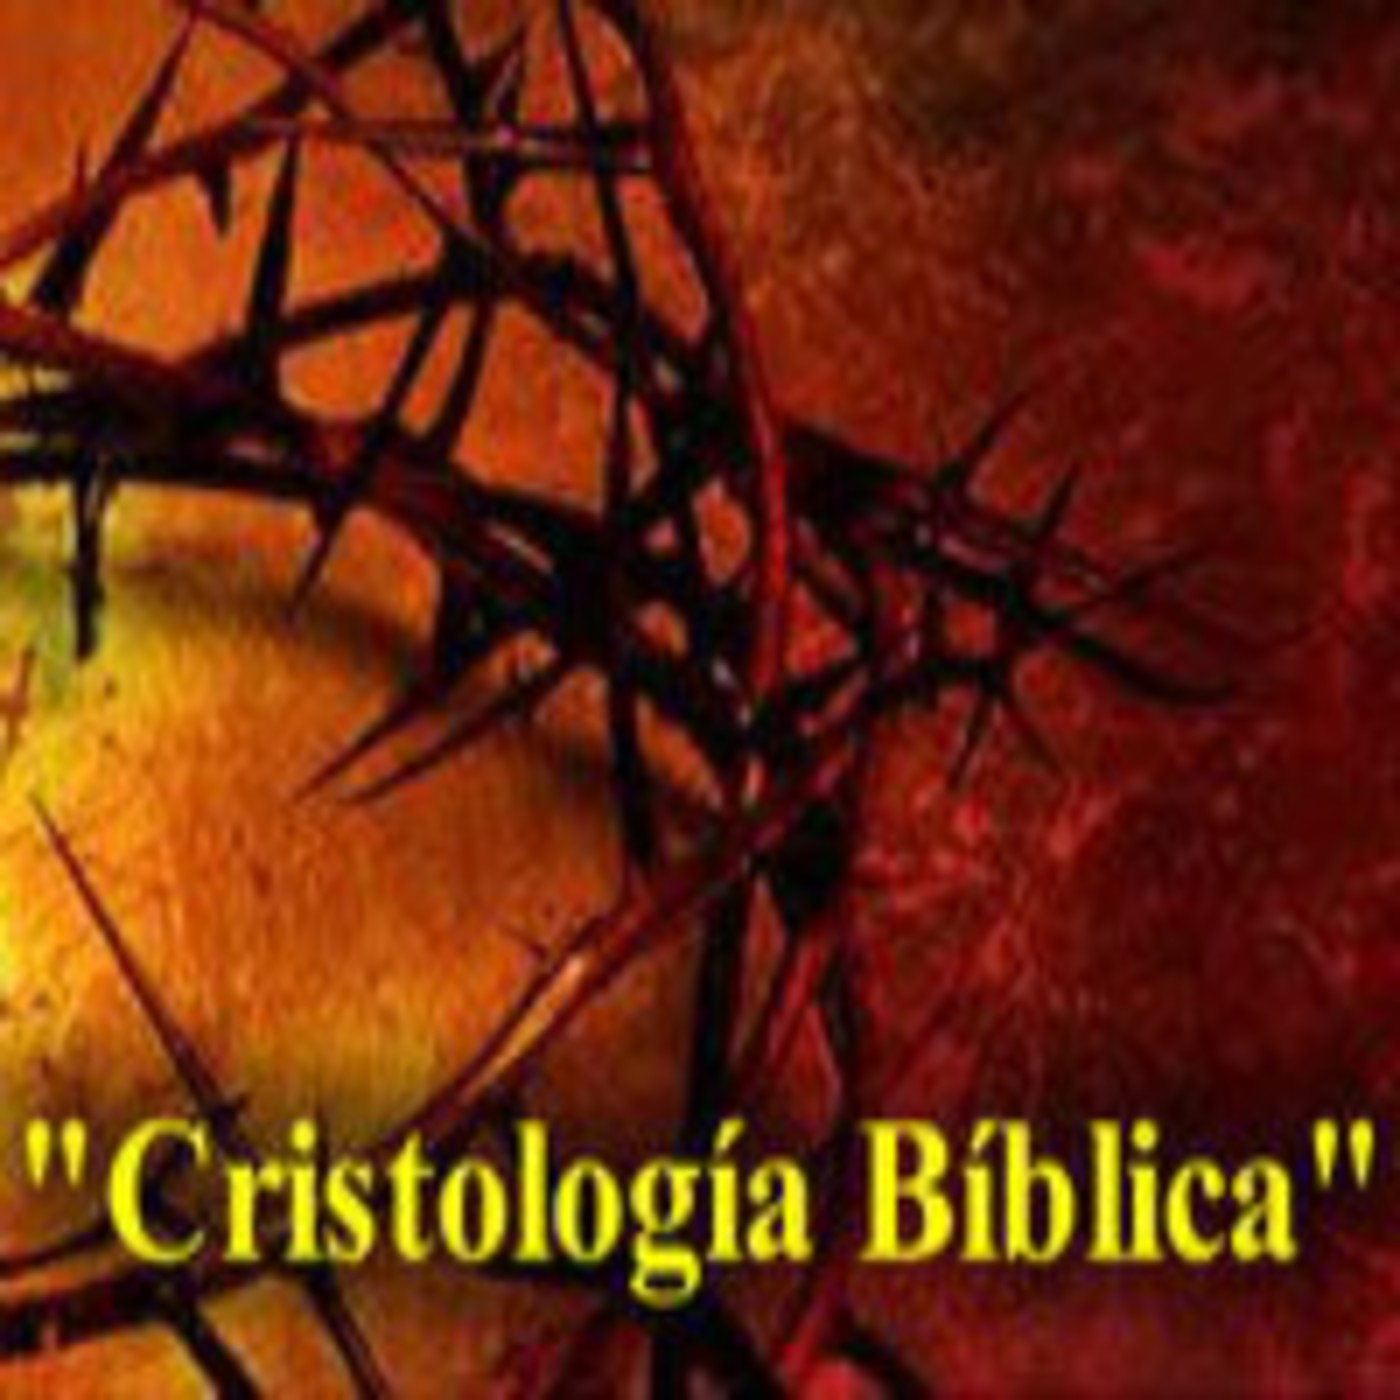 """Completa Salvación en Cristo"" (CRISTOLOGÍA BÍBLICA) 62/62, por Sugel Michelén"